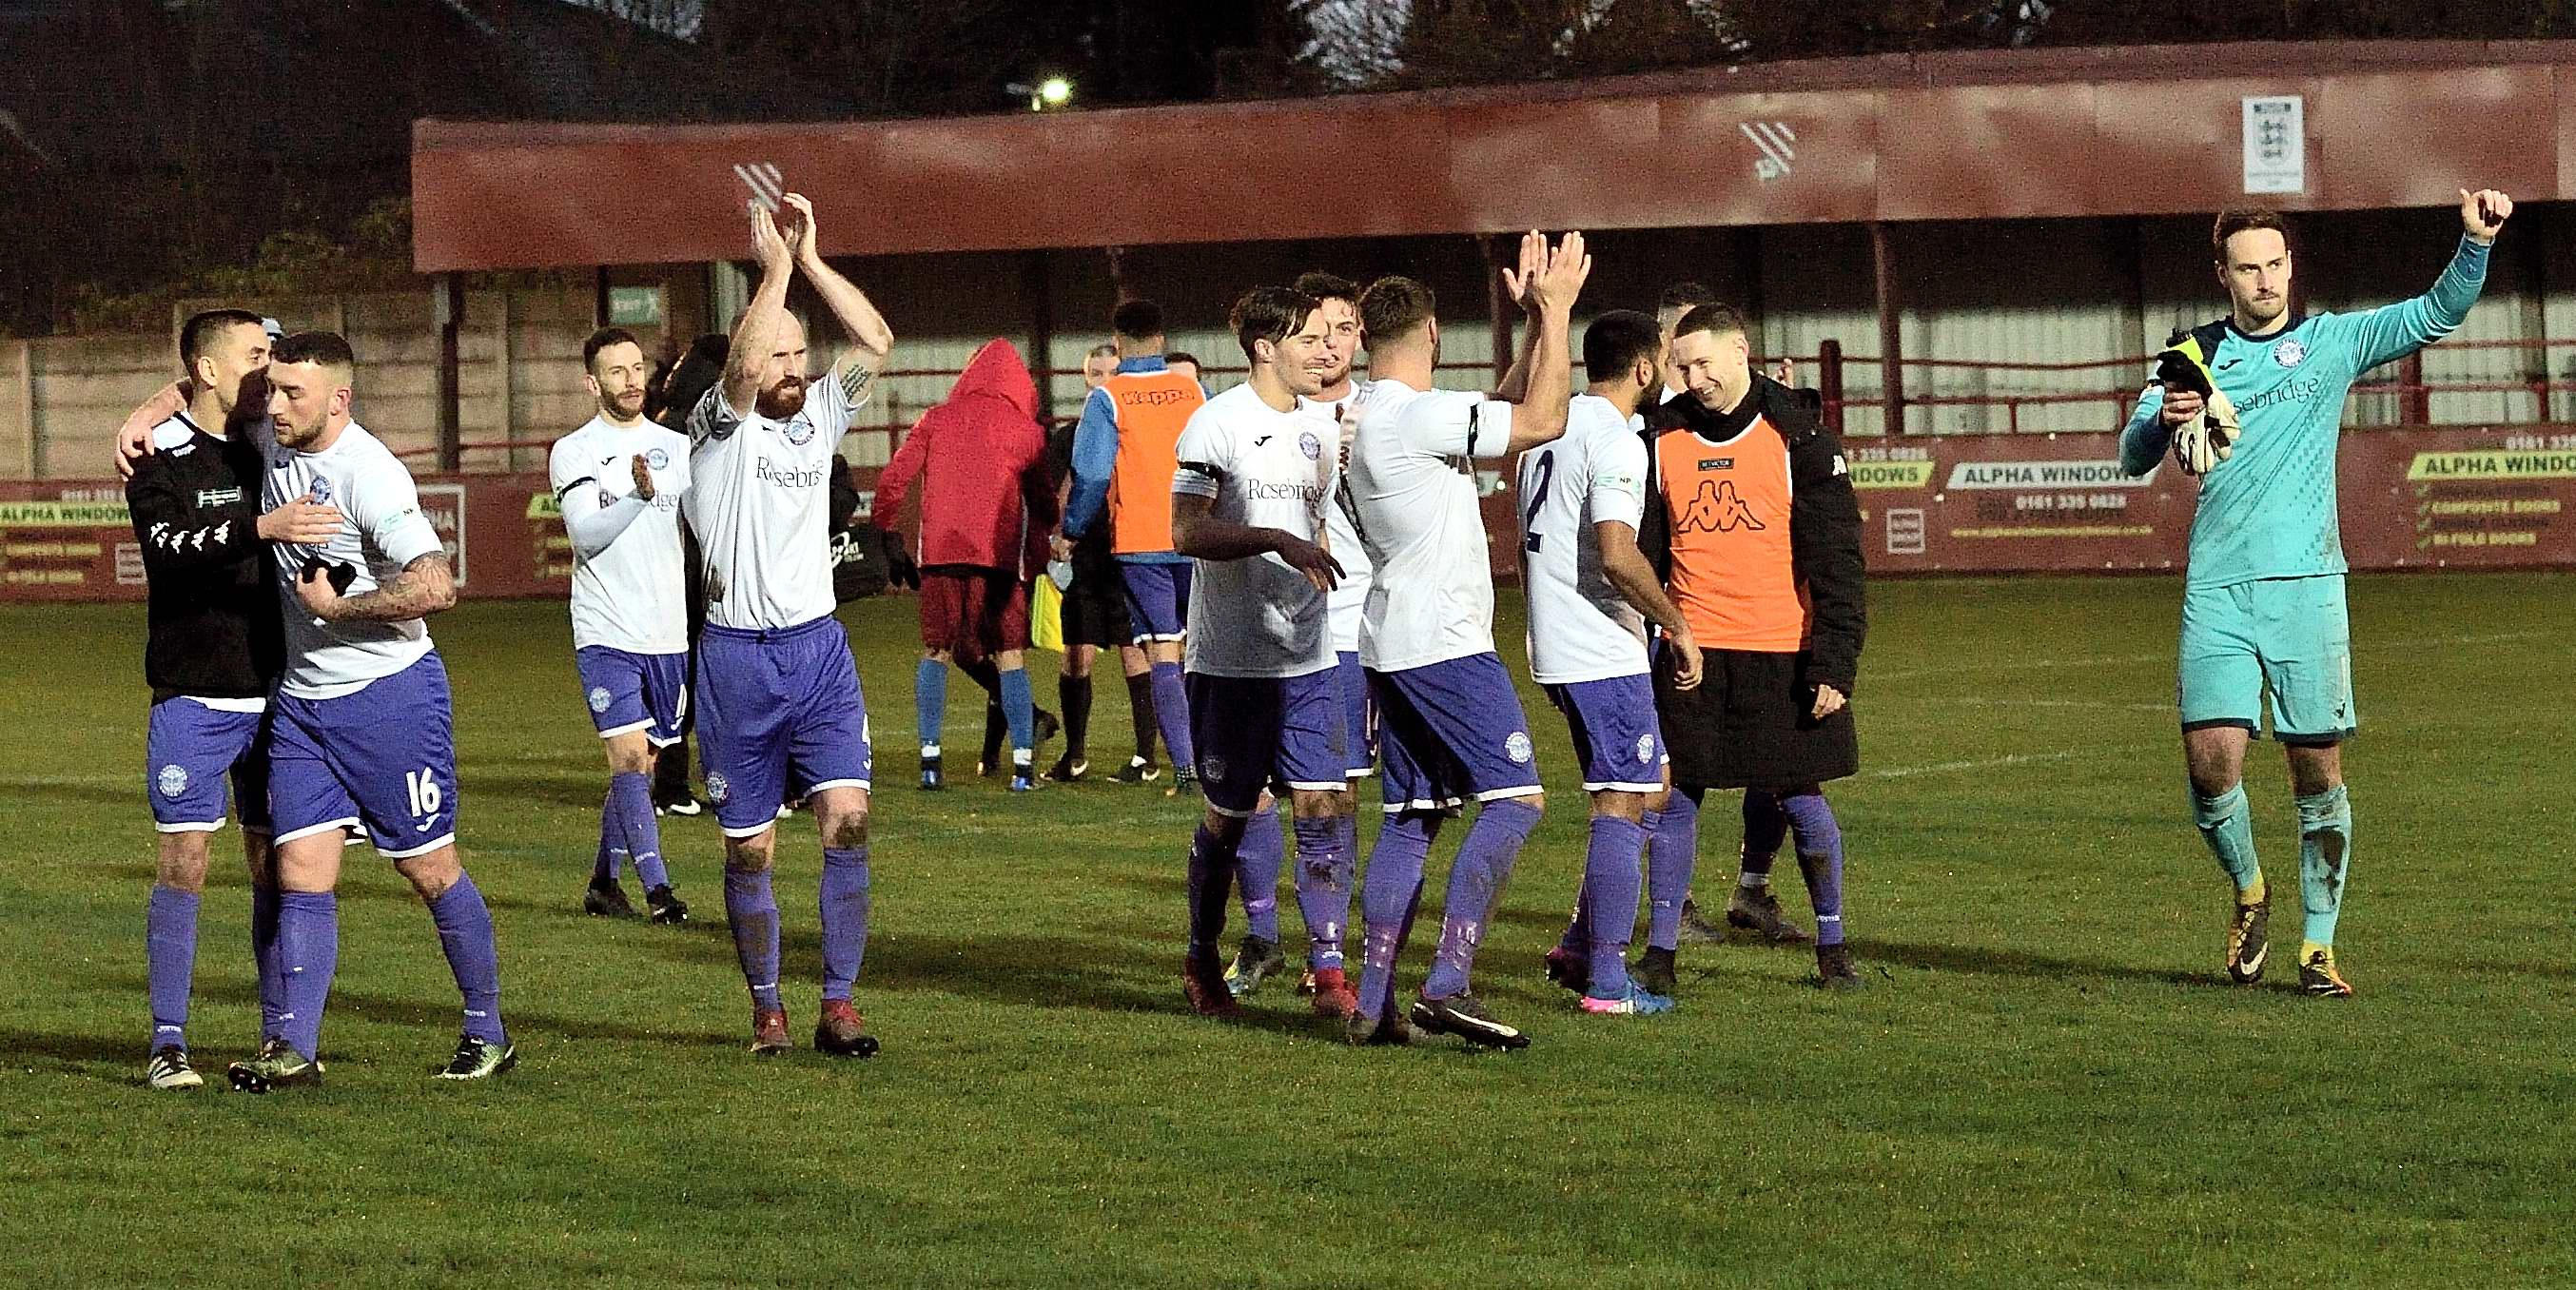 Droylsden 0 Rams 3 - Match Action